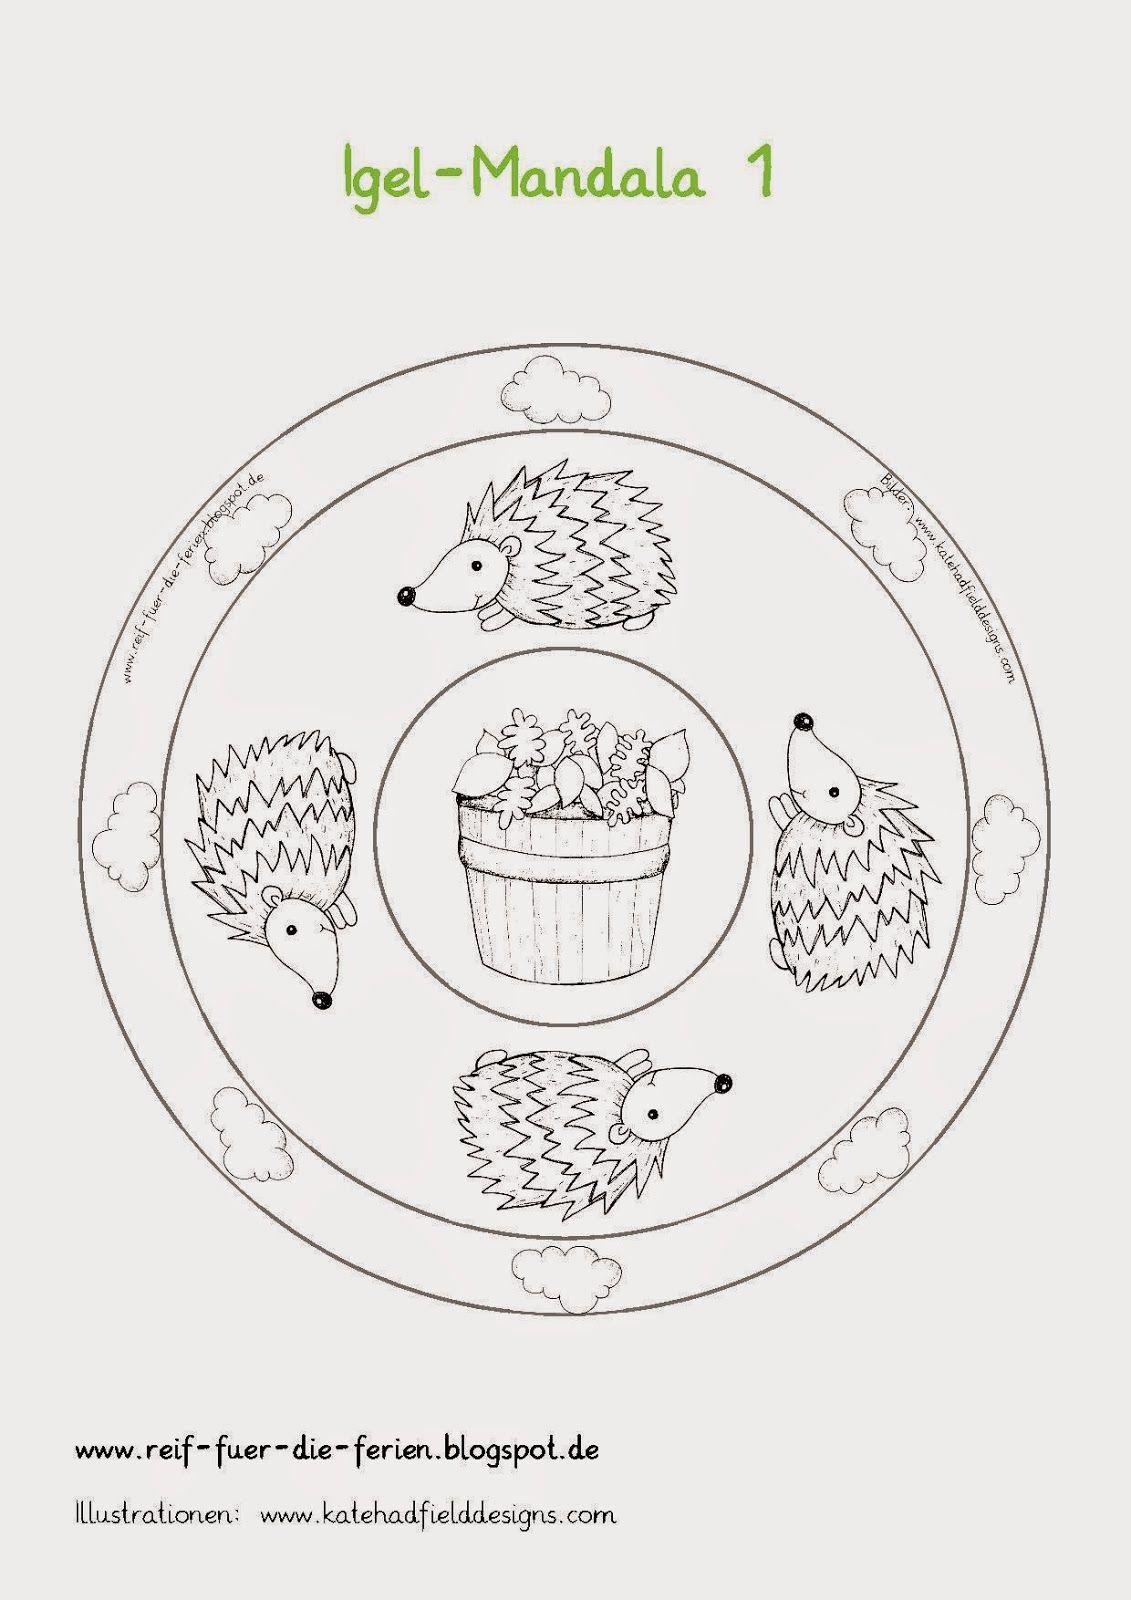 Reif Fur Die Ferien Igel Sachunterricht Kunst Mandala Igel Mandalas Ausmalbild Igel Grundschule Kostenlose M Igel Ausmalbild Igel Mandalas Zum Ausmalen